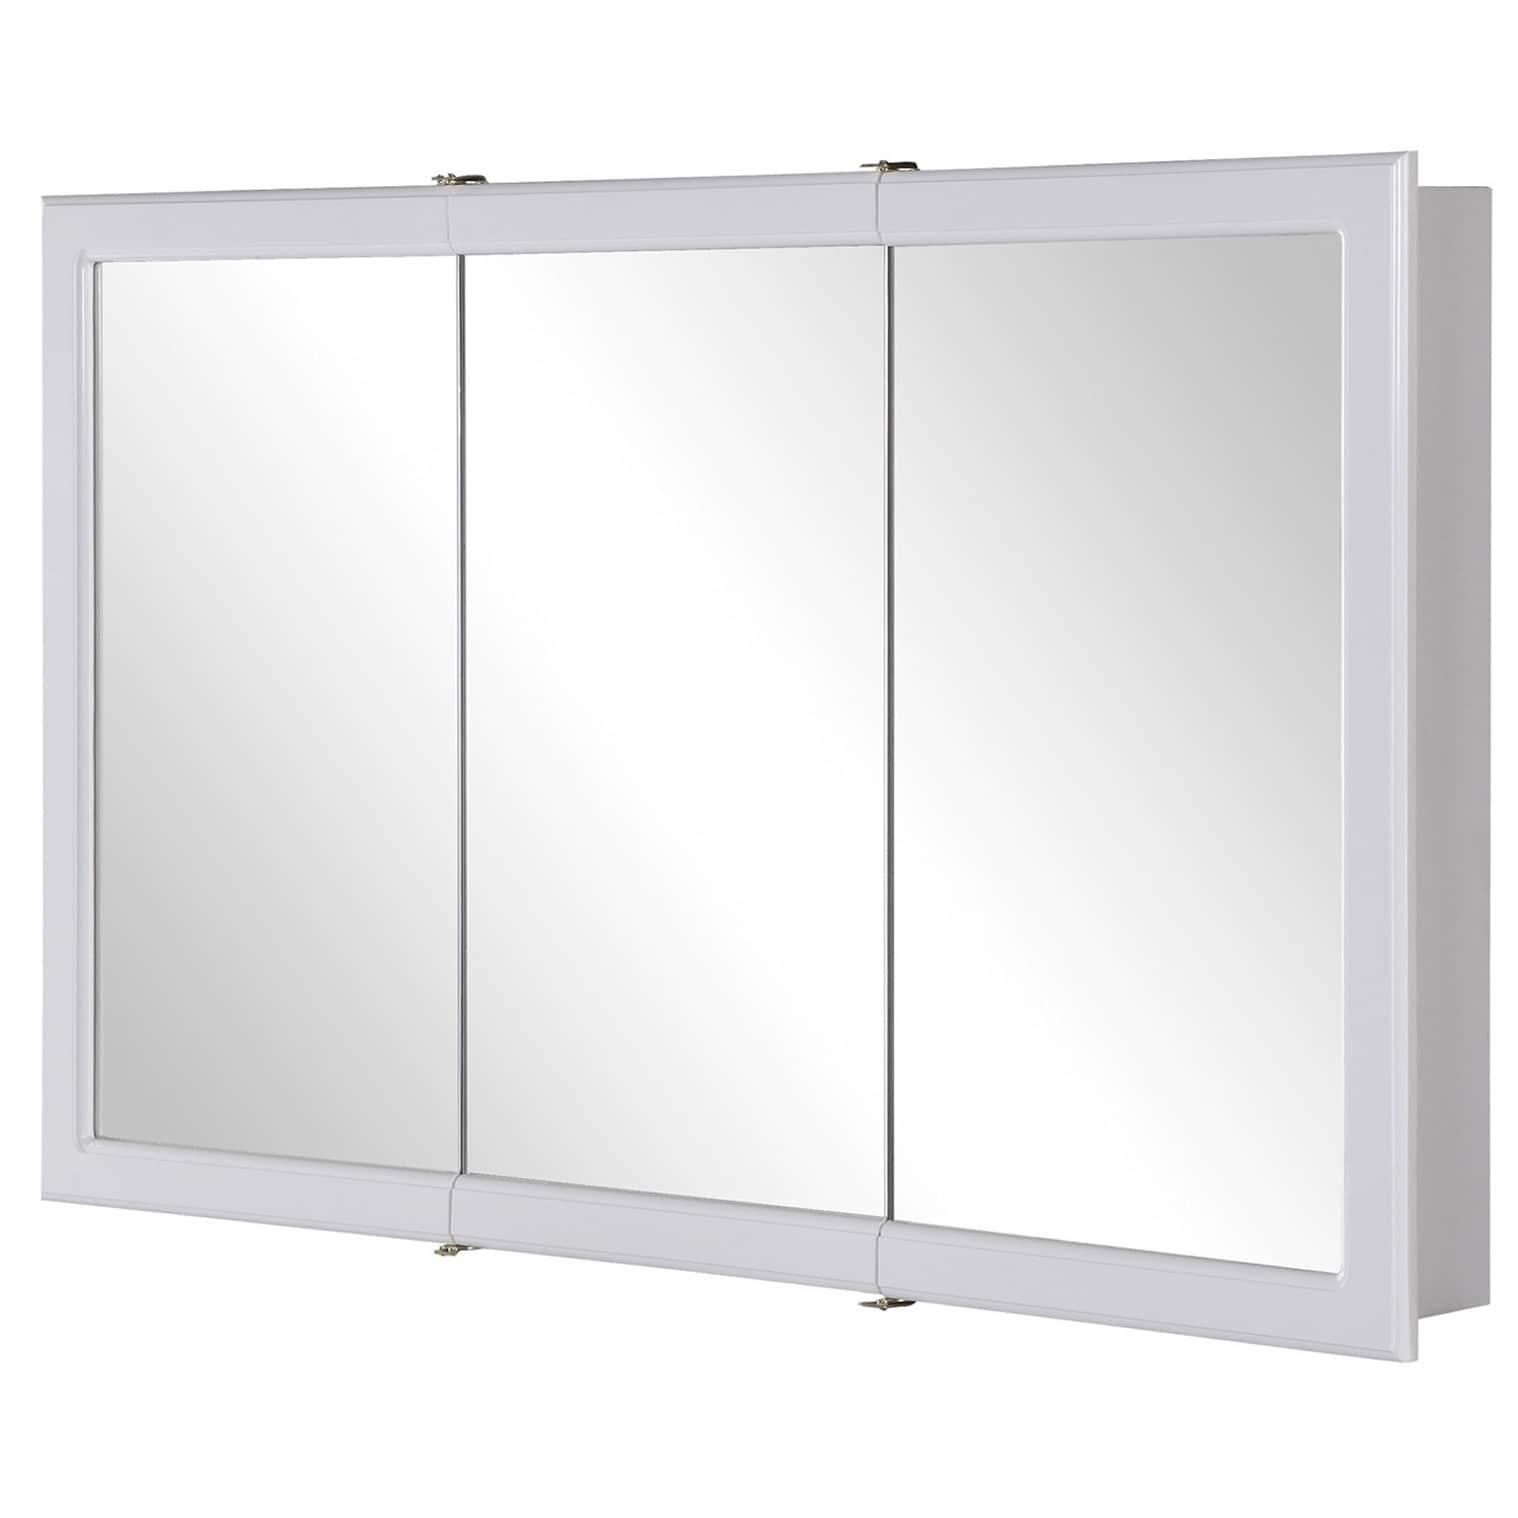 "Hardware House 419226 30"" White Aspen Medicine Cabinet (M..."